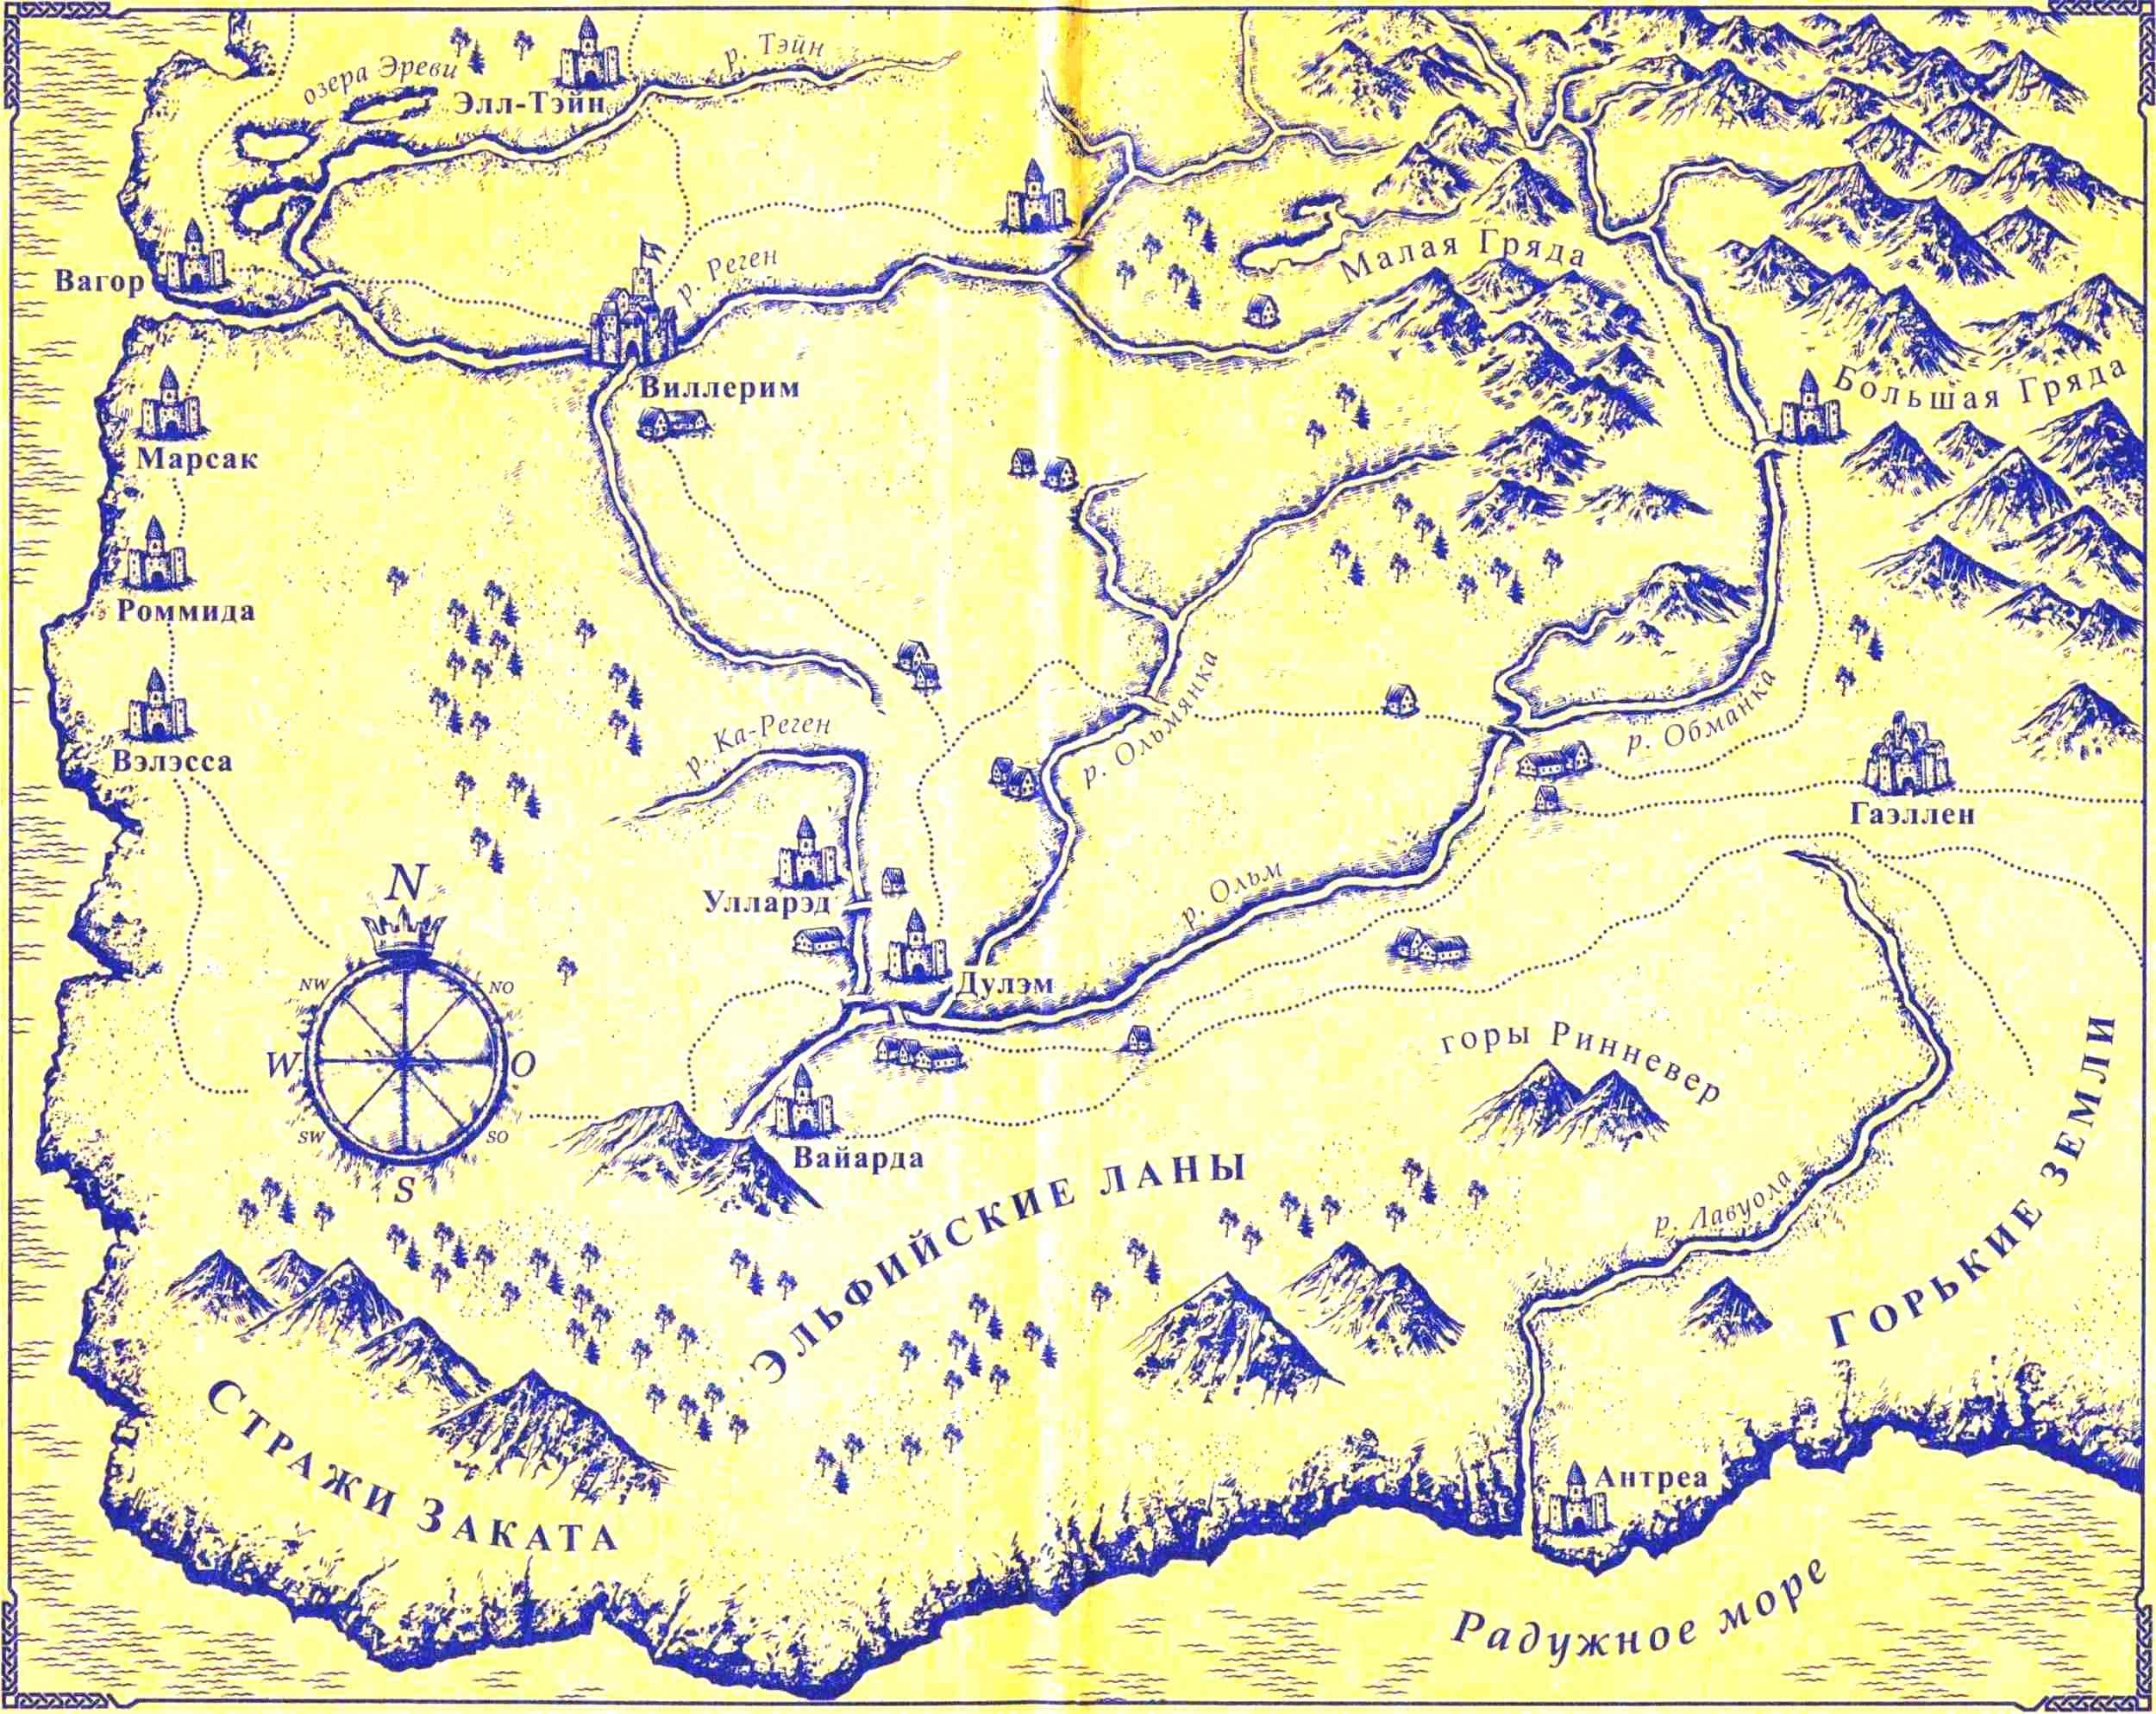 http://lib.rus.ec/i/41/171641/map.jpg